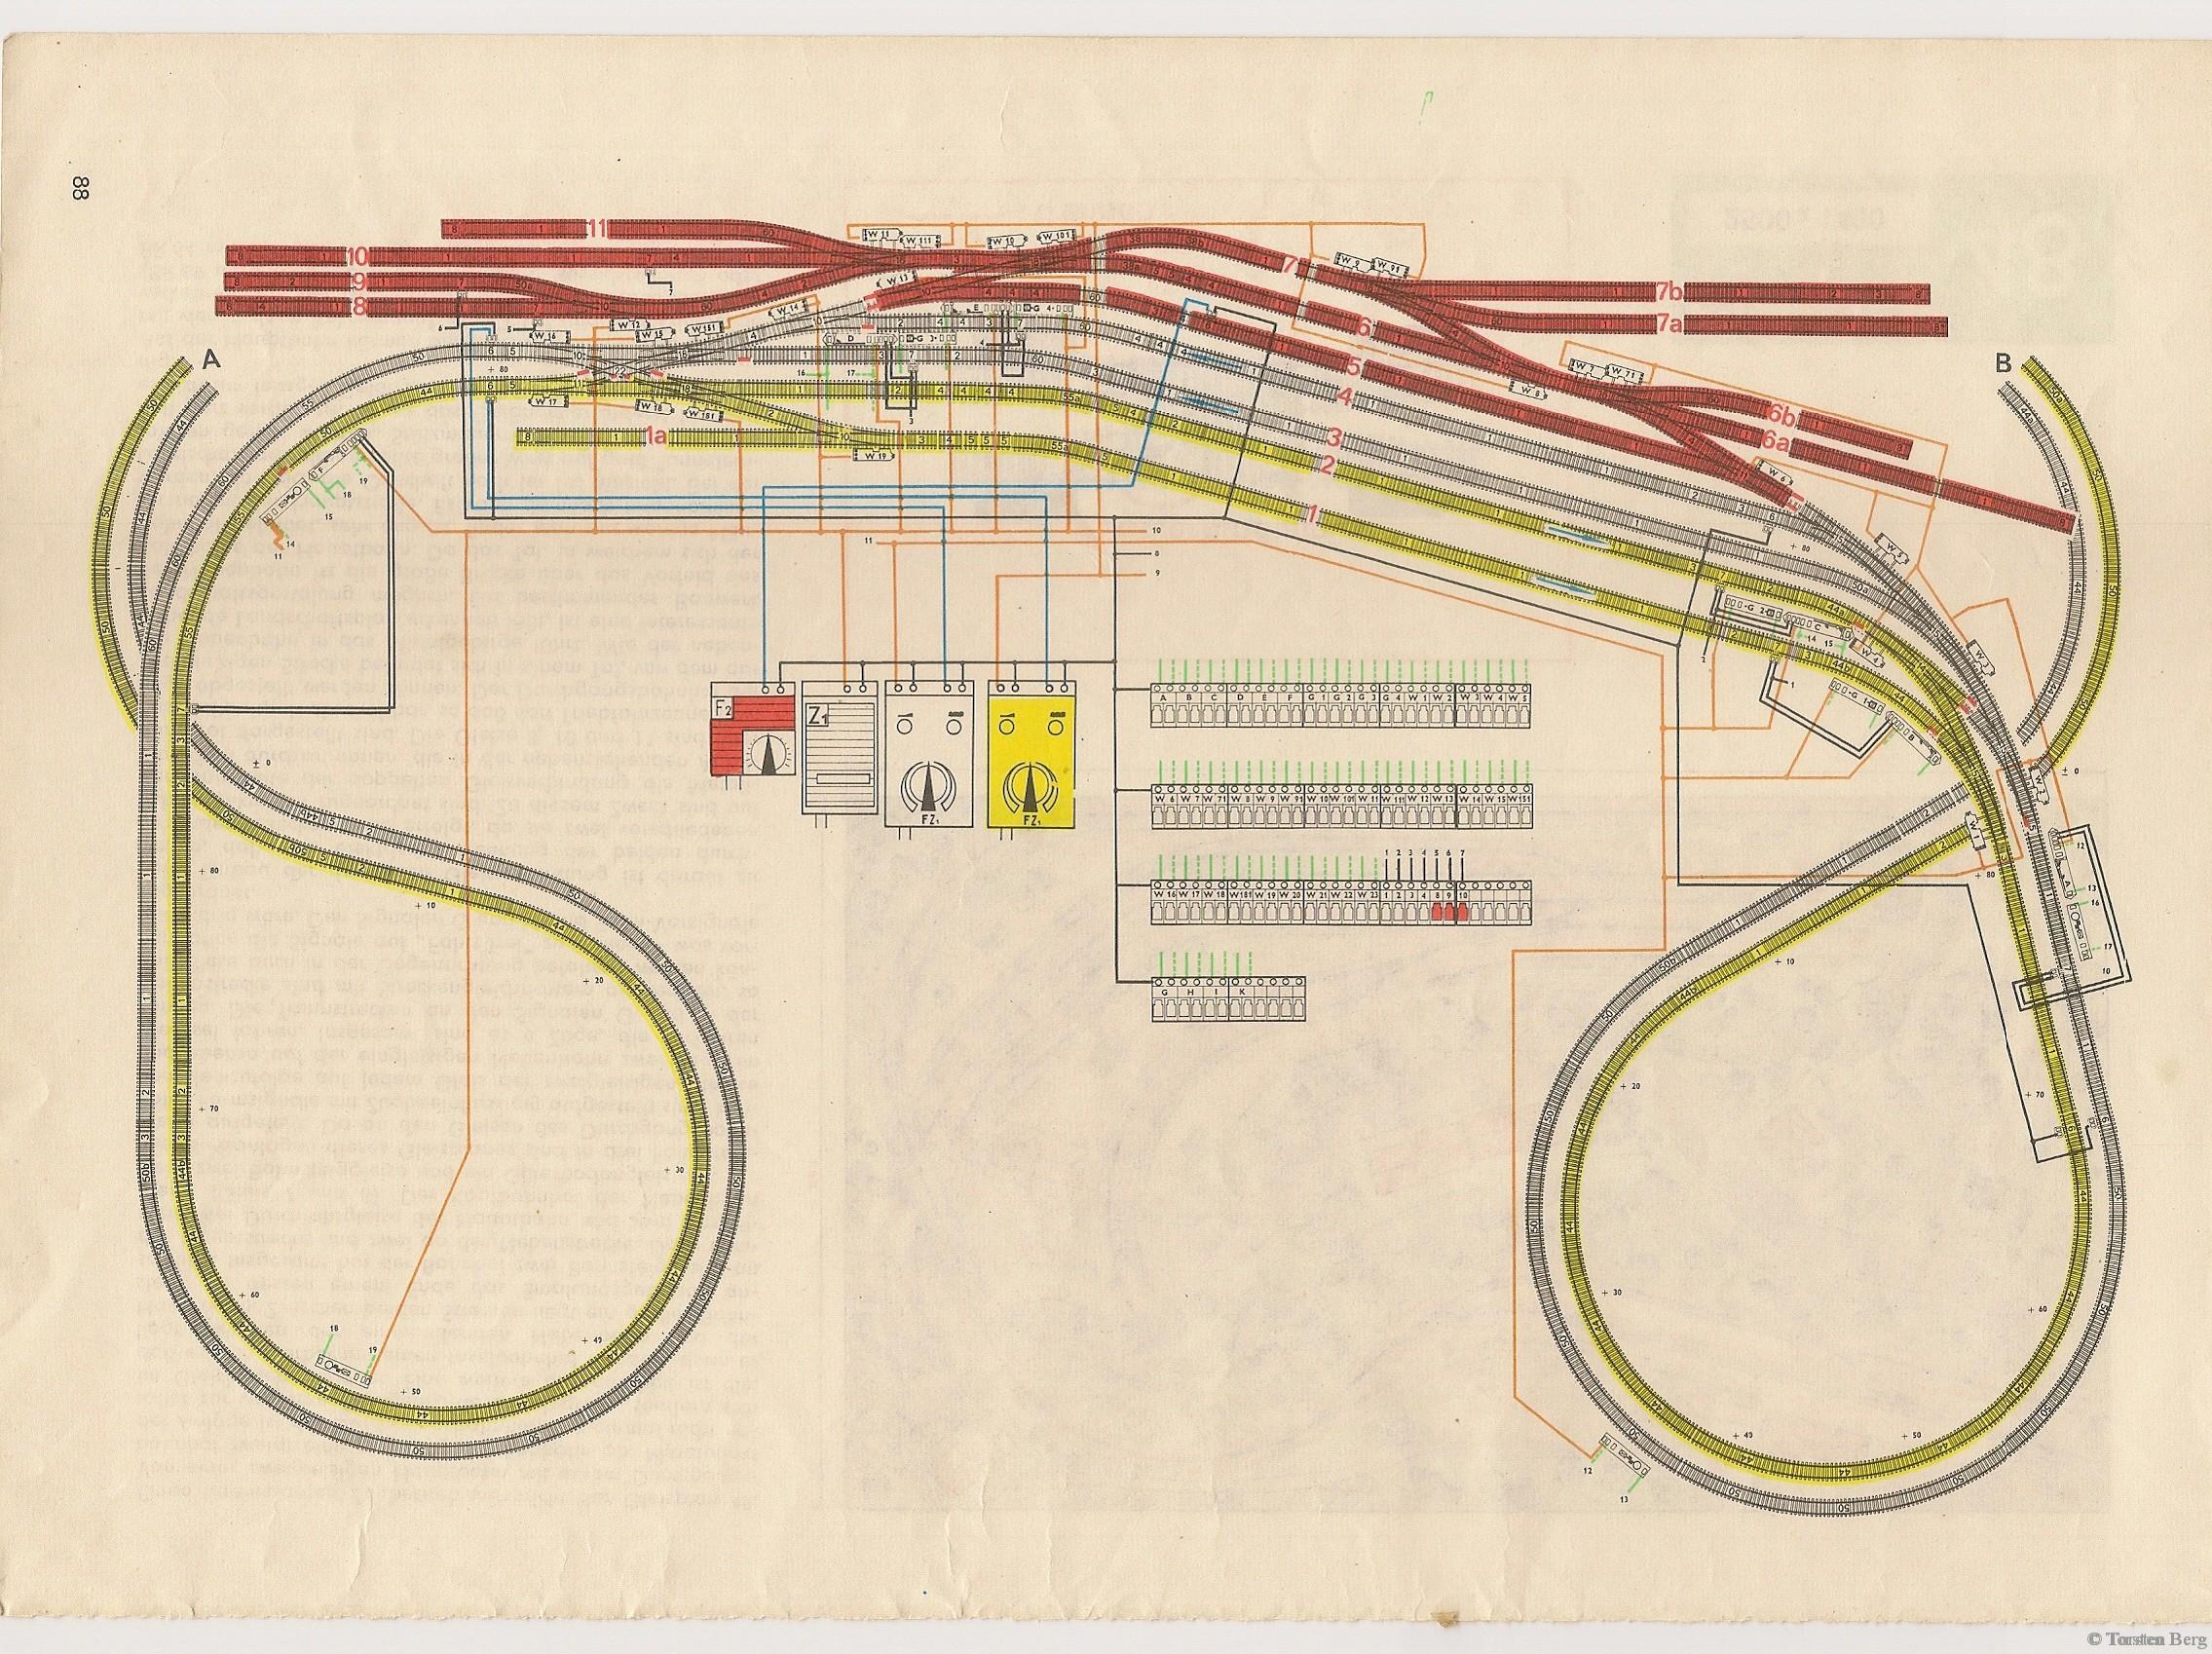 VEB Kombinat PIKO Standardgleis-Gleisplan 49